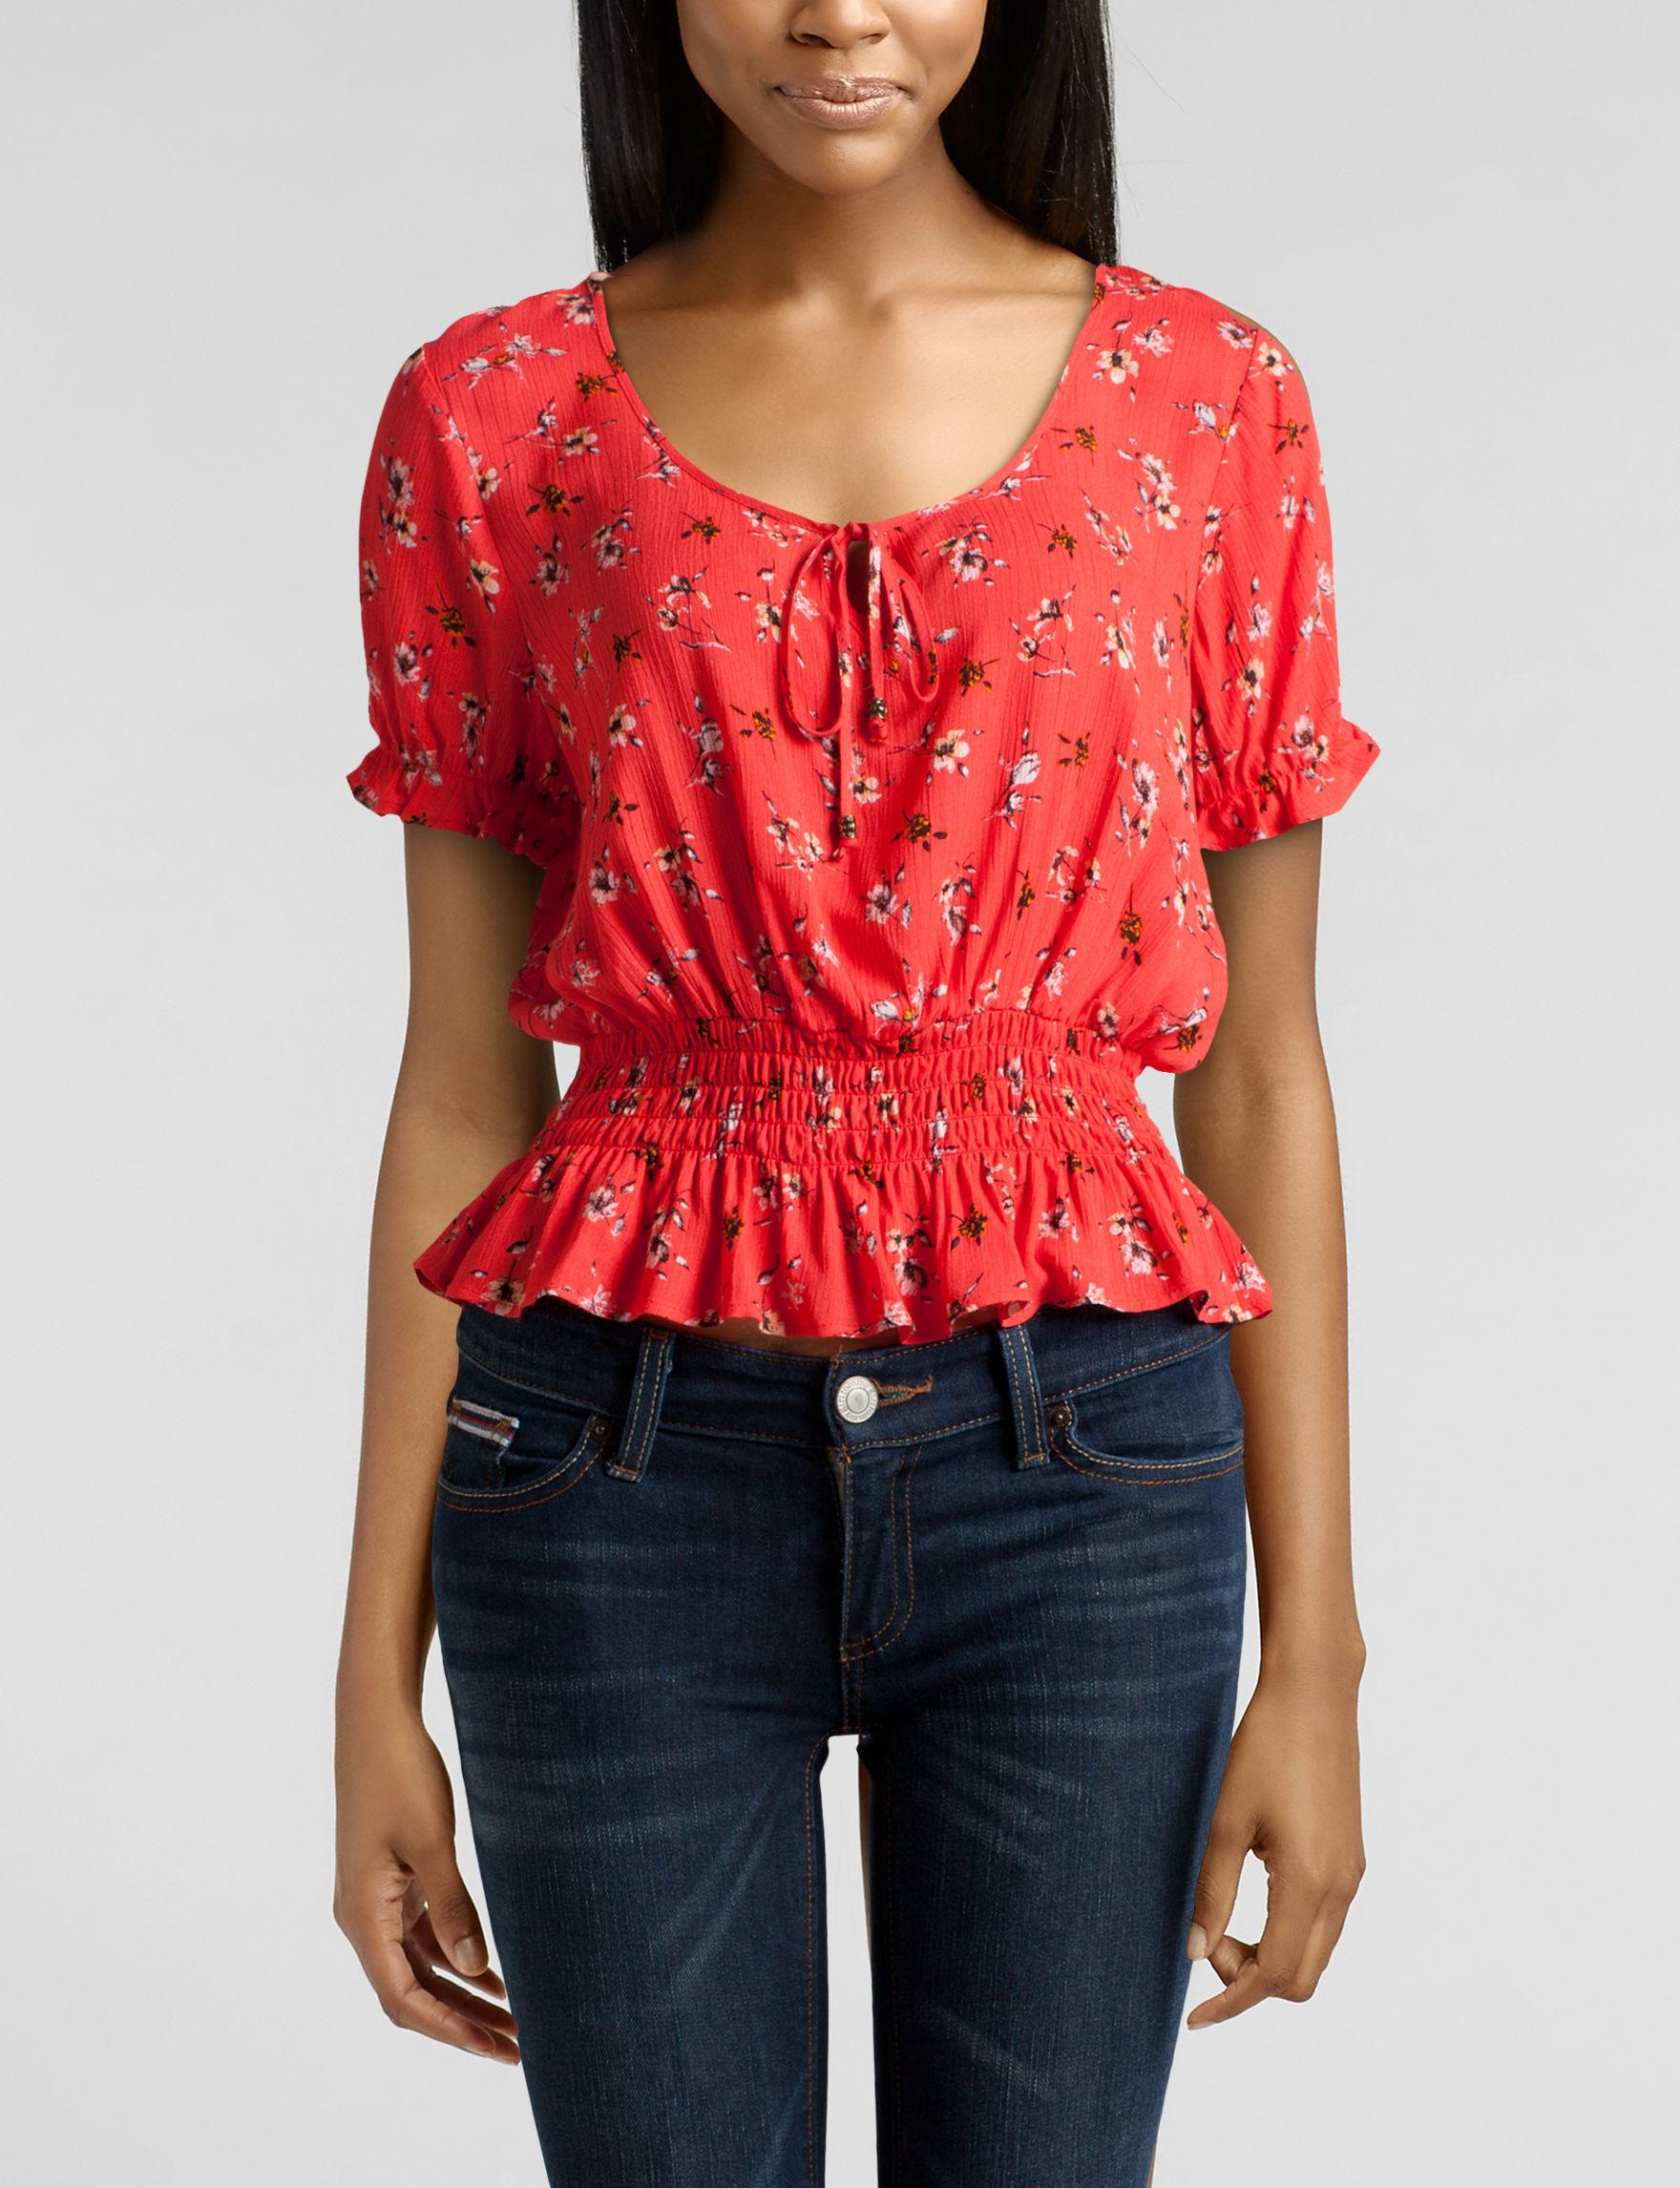 Jolt Red Shirts & Blouses